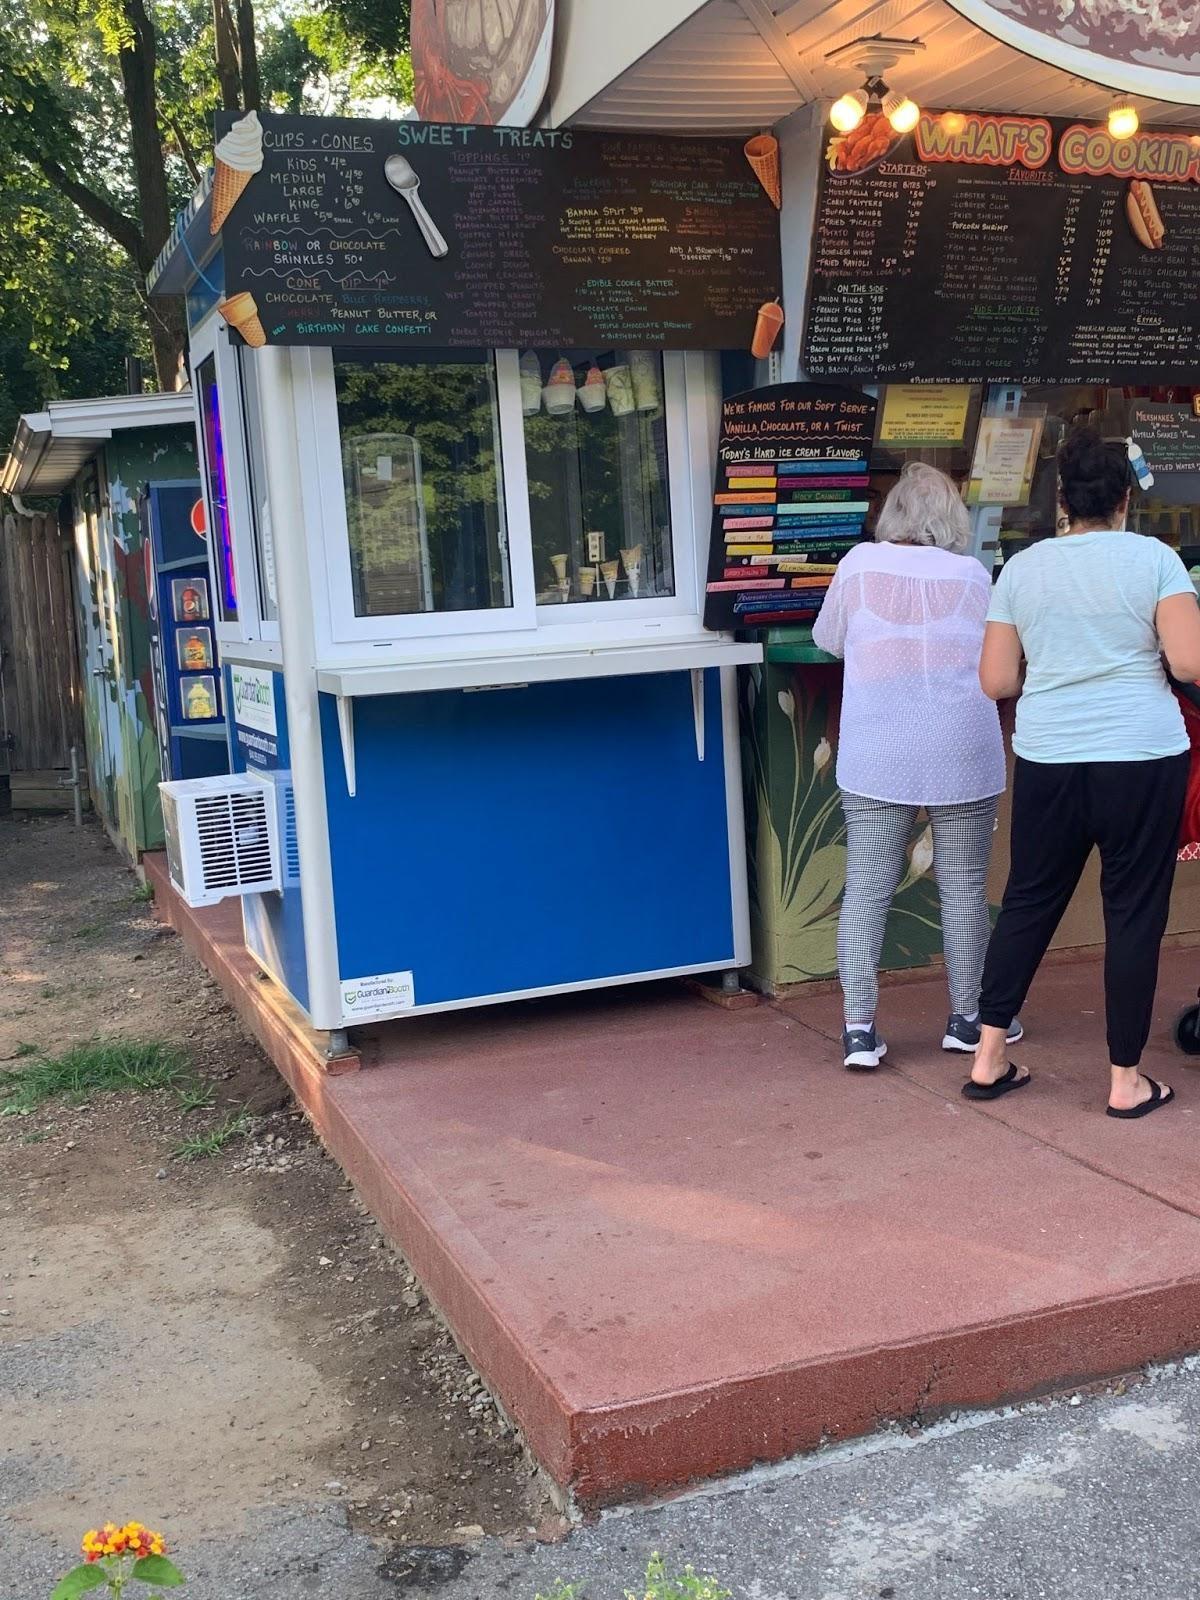 Ice cream food kiosk